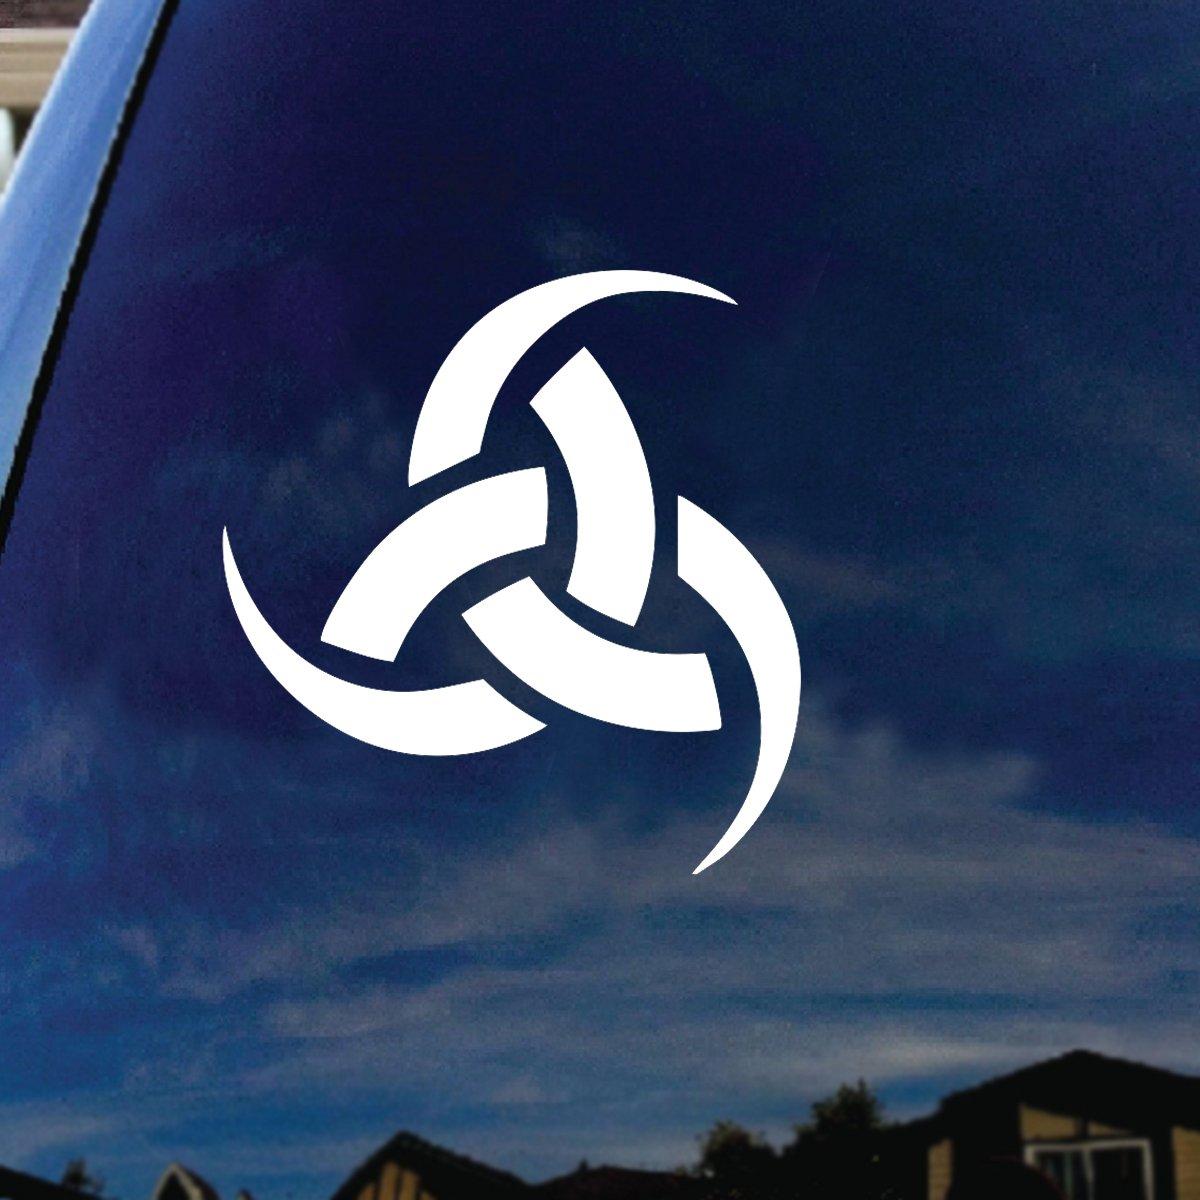 Amazon odin triple horn car truck laptop sticker decal 4 amazon odin triple horn car truck laptop sticker decal 4 diameter automotive buycottarizona